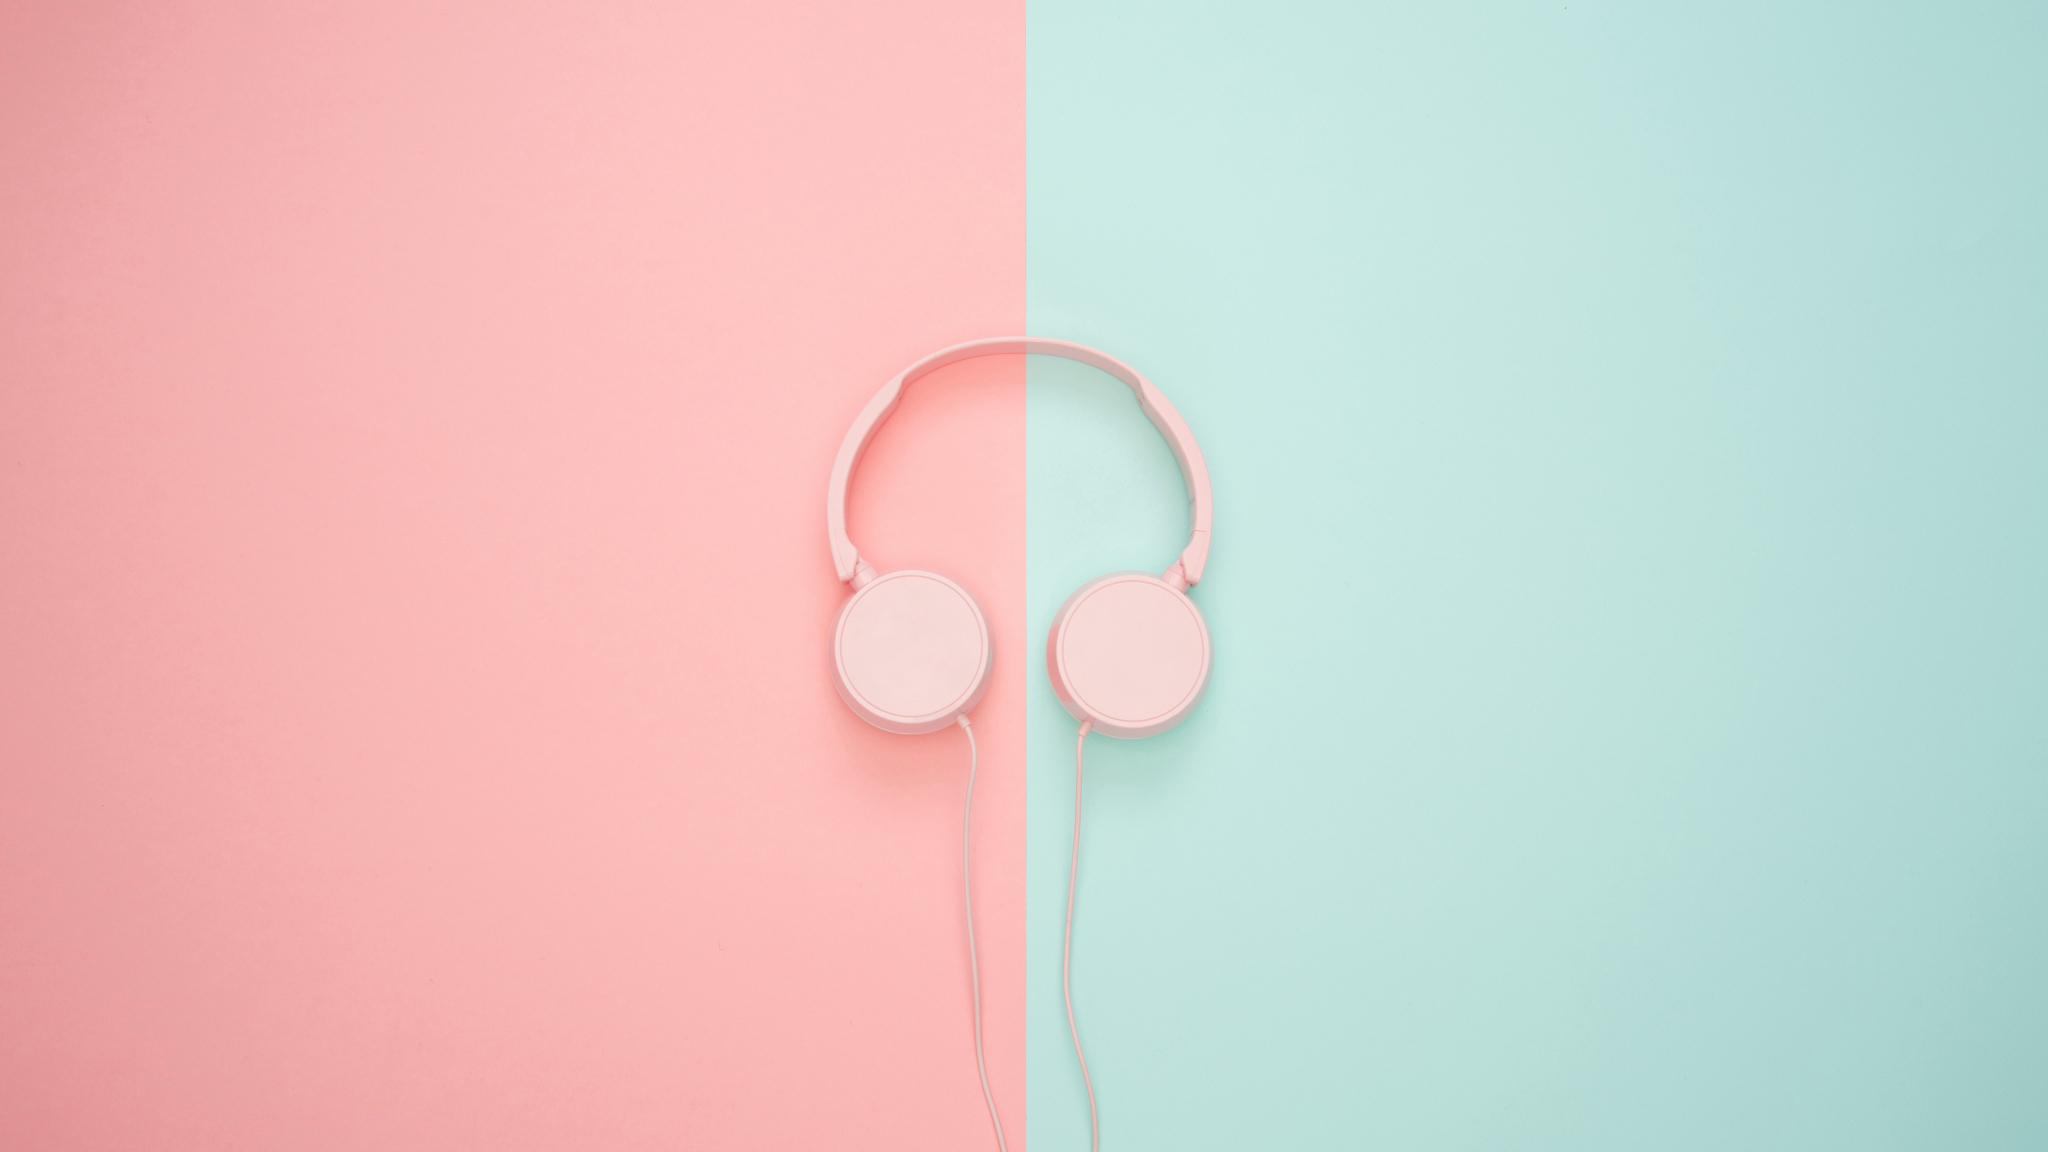 Download 2048x1152 Wallpaper Headphones Music Minimal